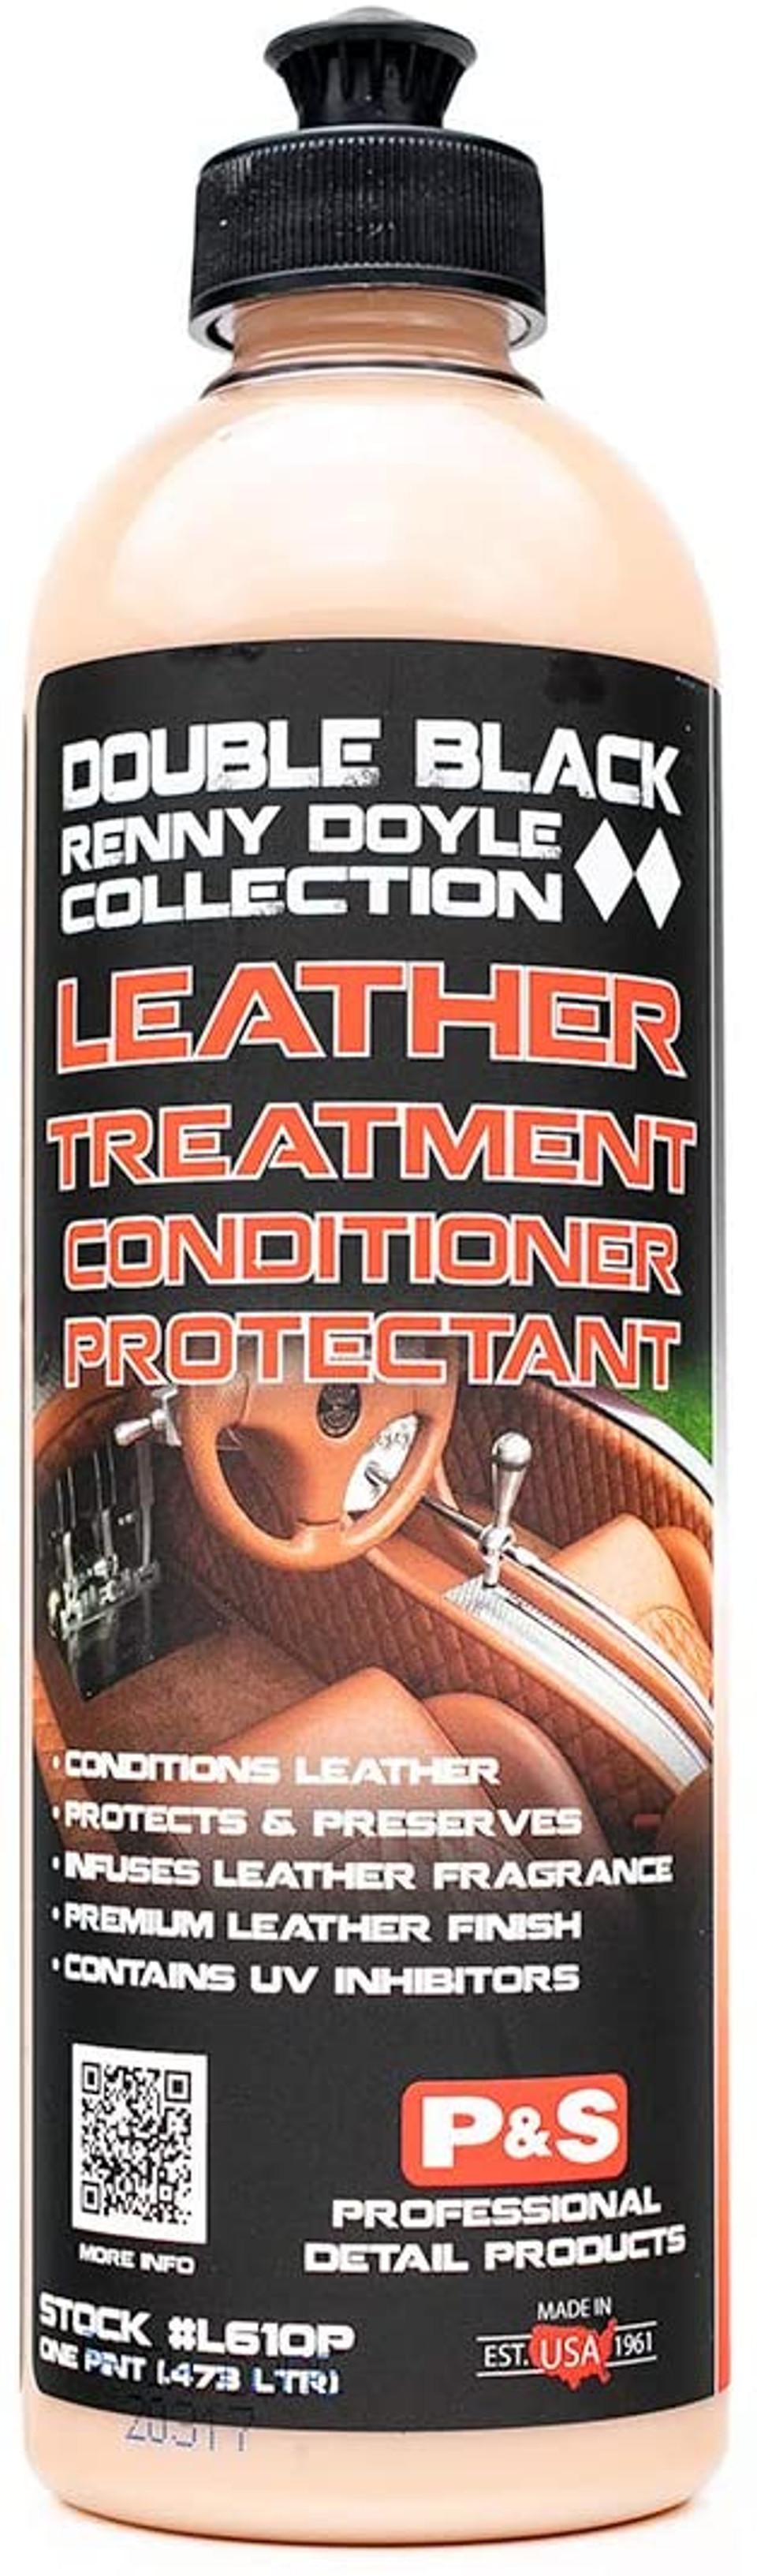 P&S Leather Treatment 16oz | Double Black Leather Conditioner